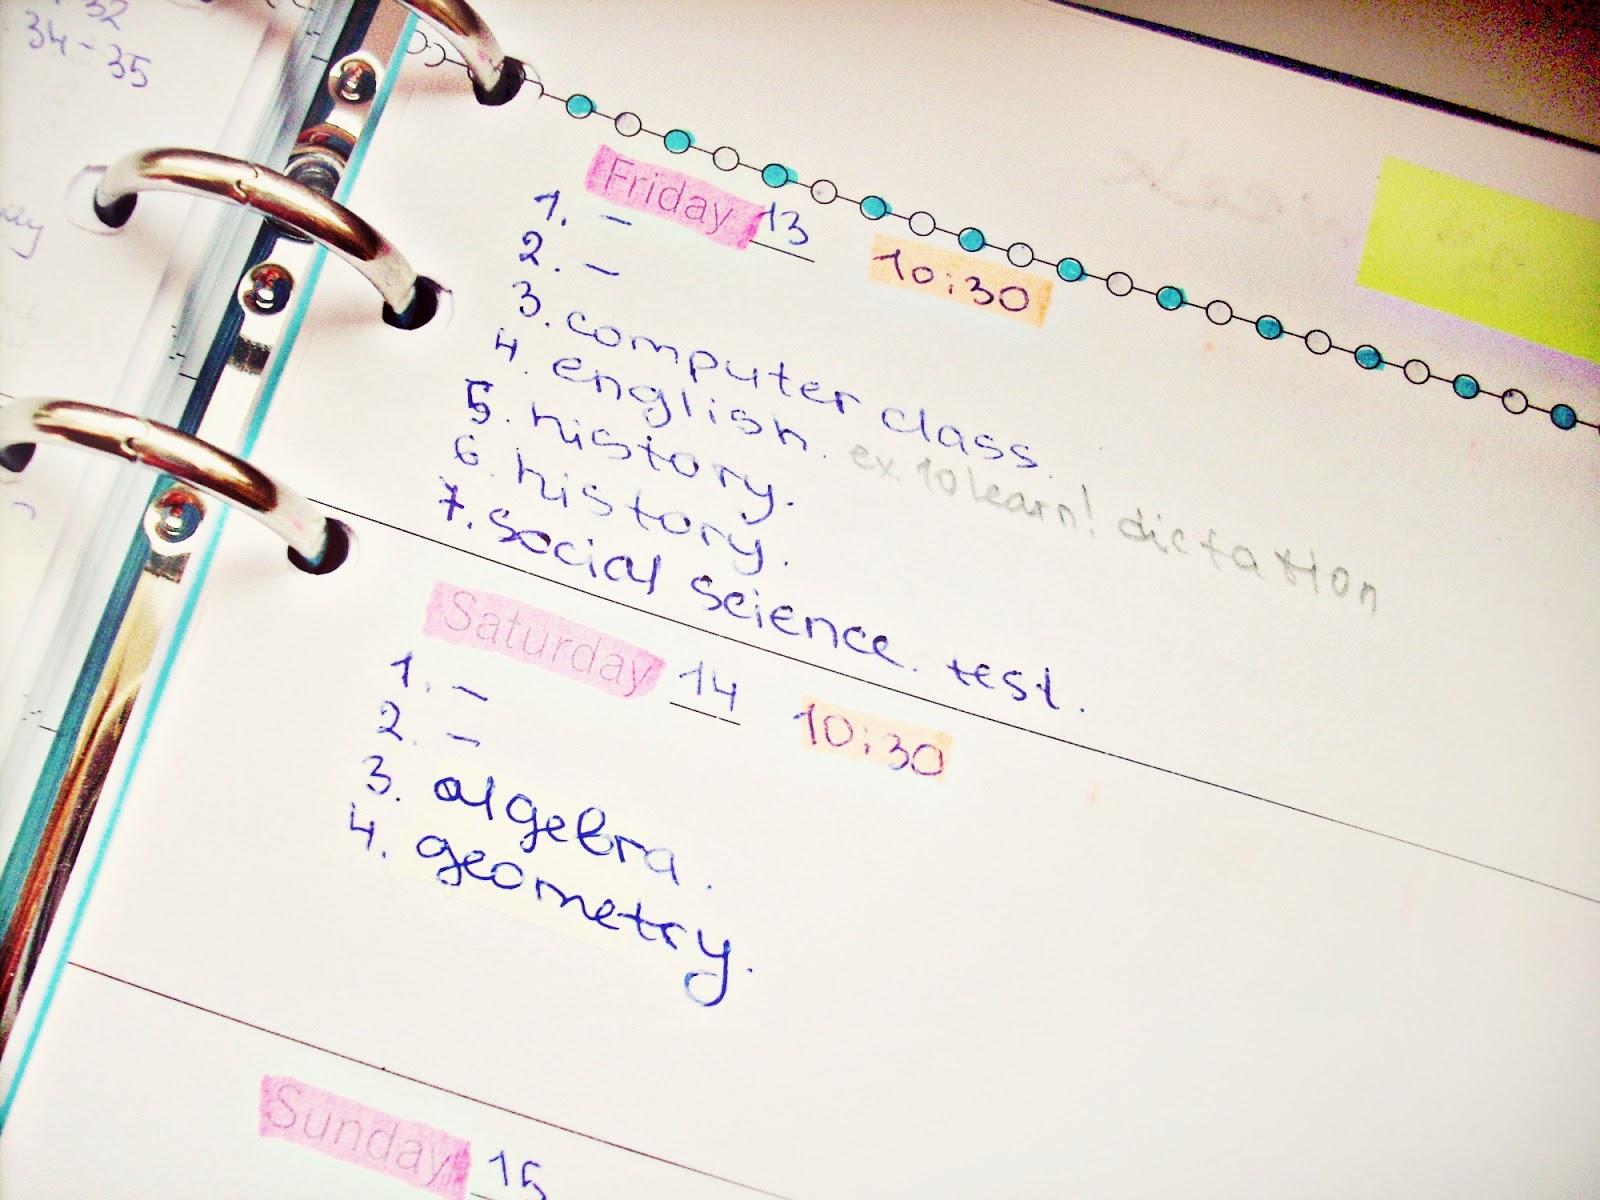 Alina Ermilova 8 Tips How To Organize Your School Agenda – School Agenda